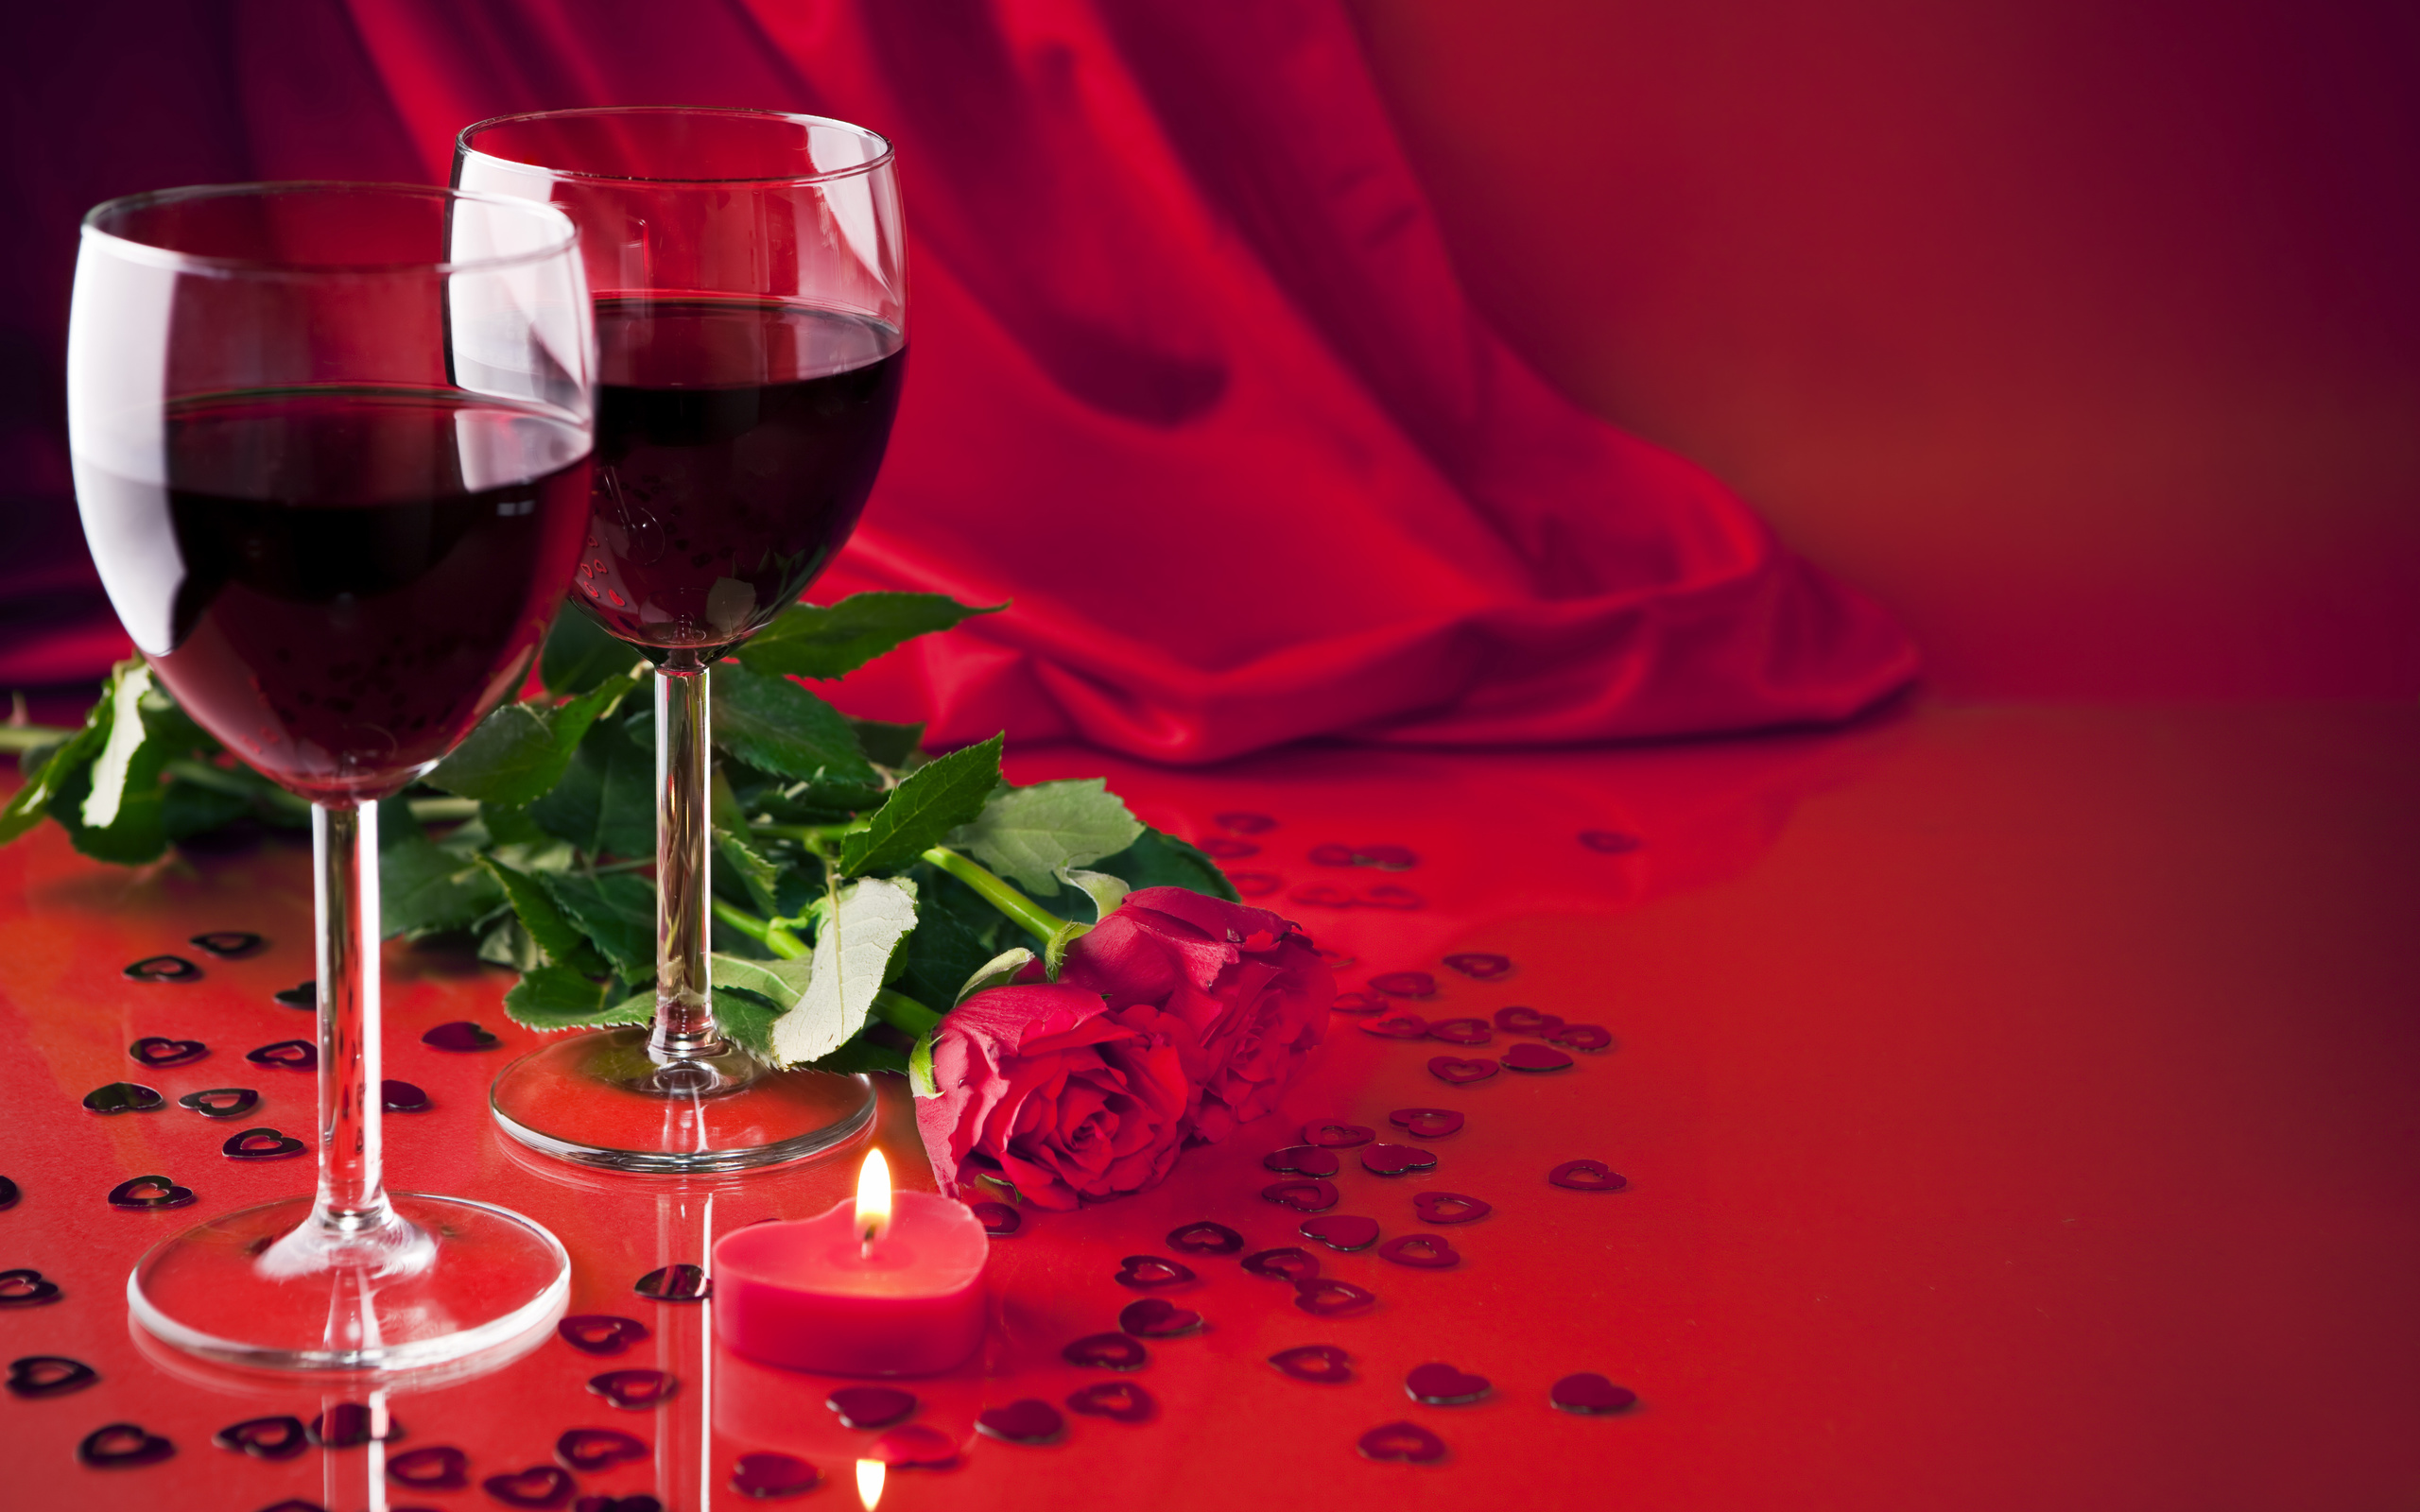 Открытки с цветами и вино